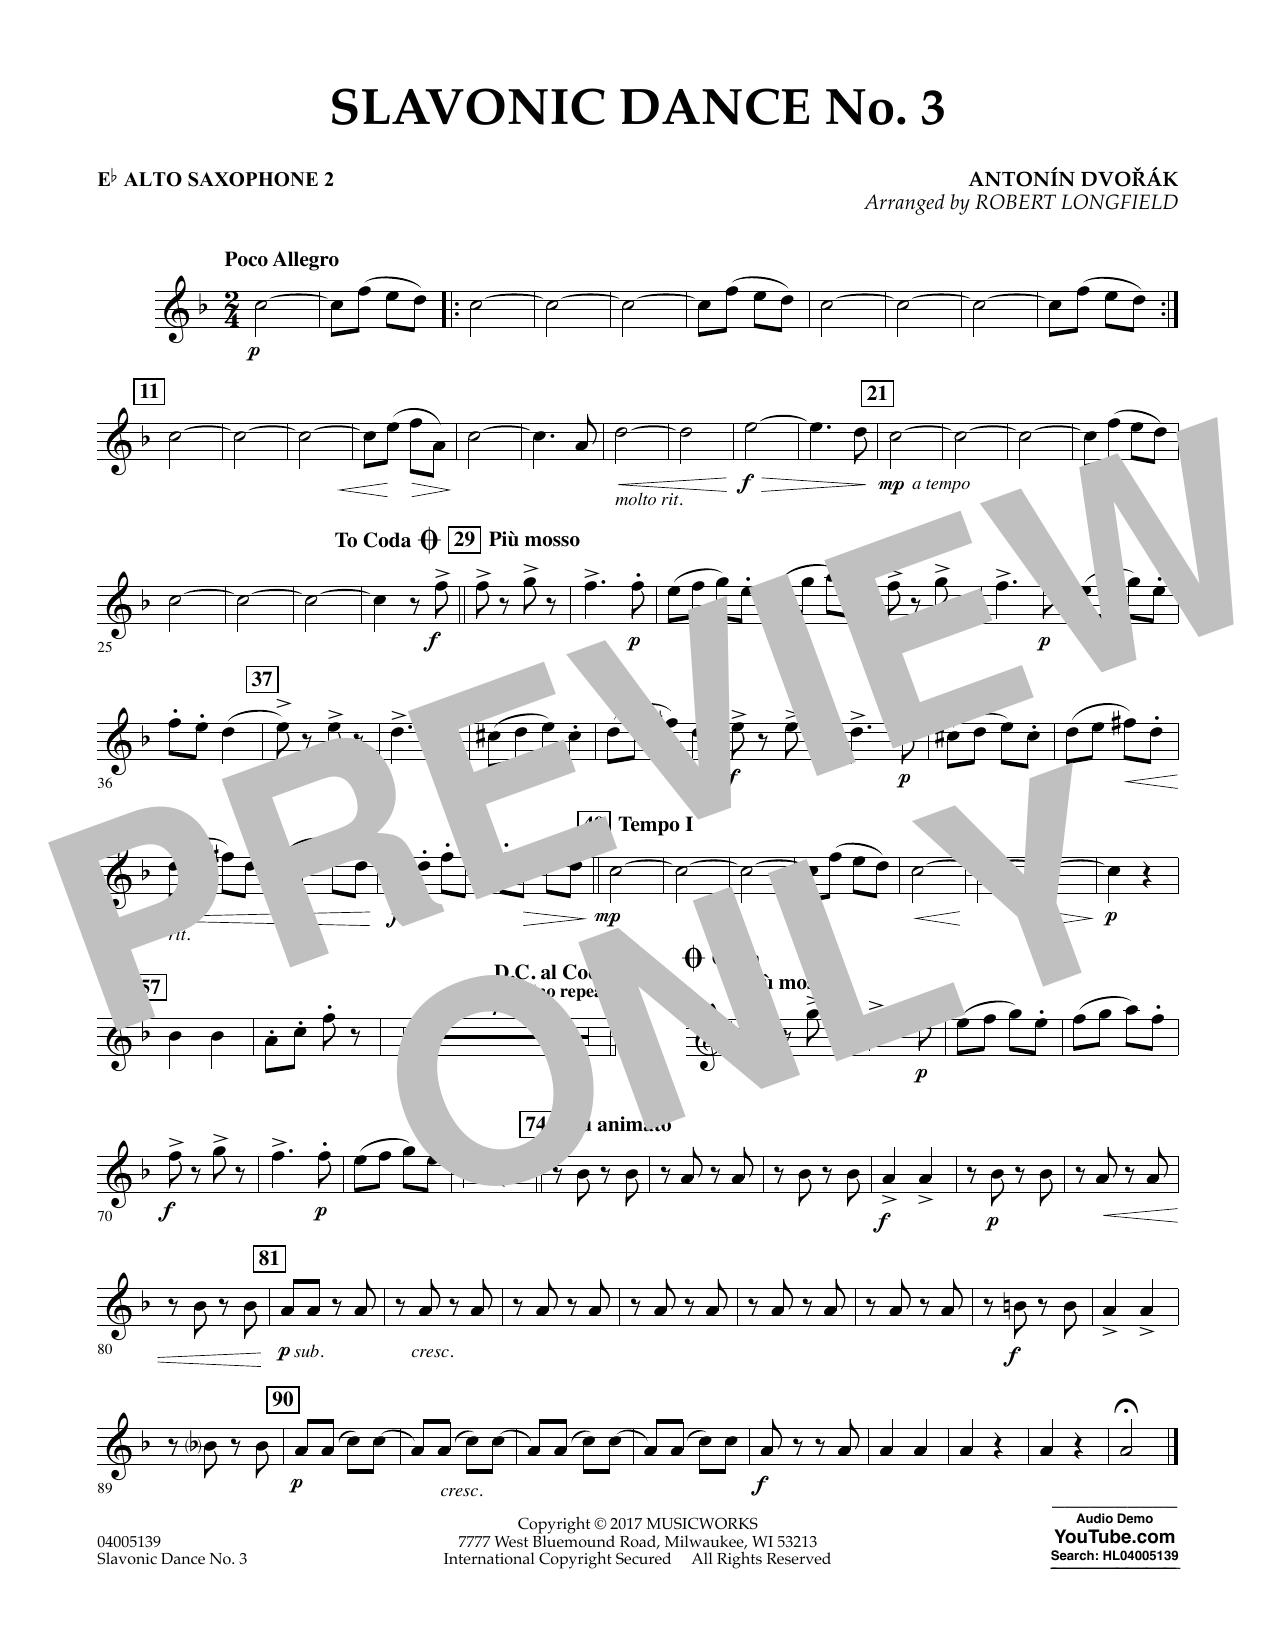 Robert Longfield Slavonic Dance No. 3 - Eb Alto Saxophone 2 sheet music notes and chords. Download Printable PDF.